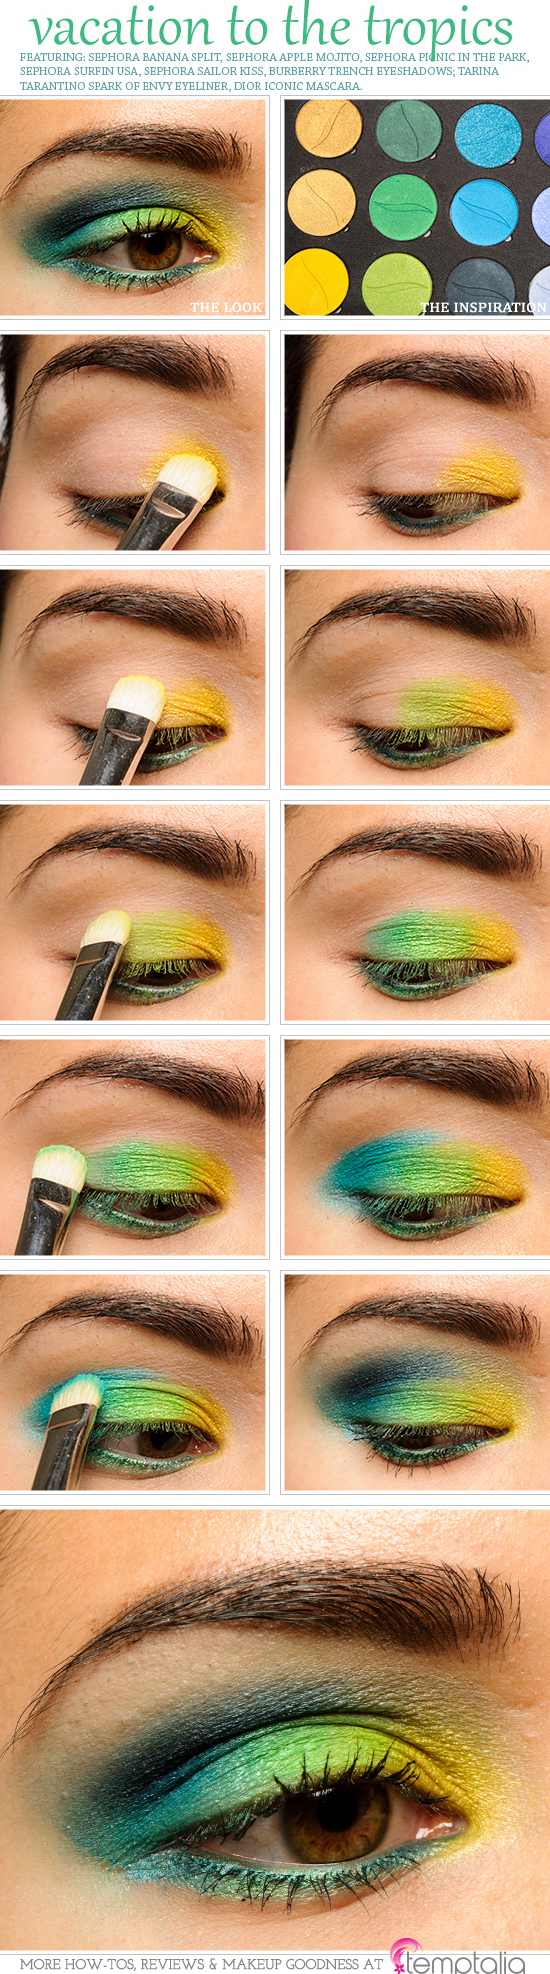 Sephora Picnic in the Park (07) Eyeshadow